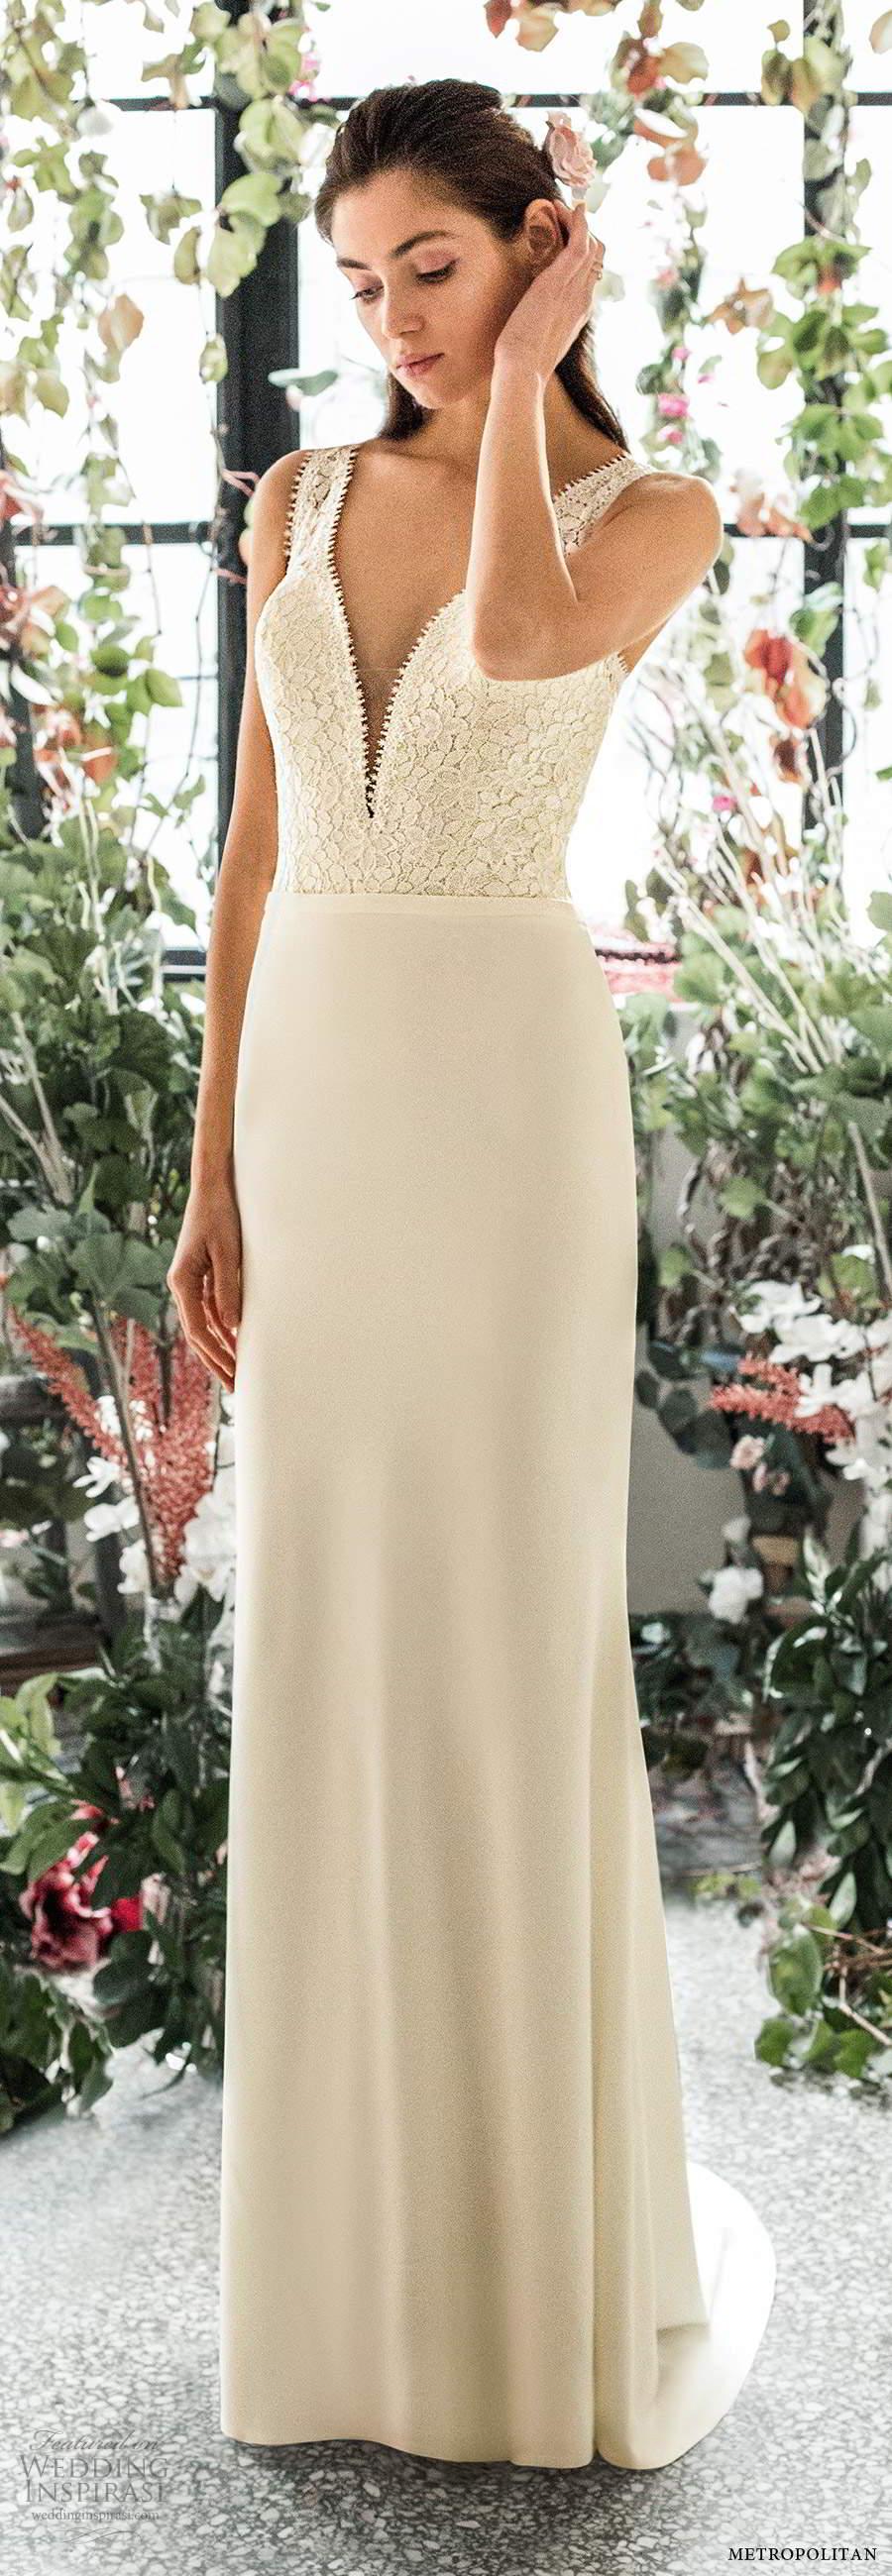 metropolitan spring 2020 bridal sleeveless thick straps plunging v neckline embellished lace bodice clean skirt elegant sheath wedding dress chapel train (16) mv